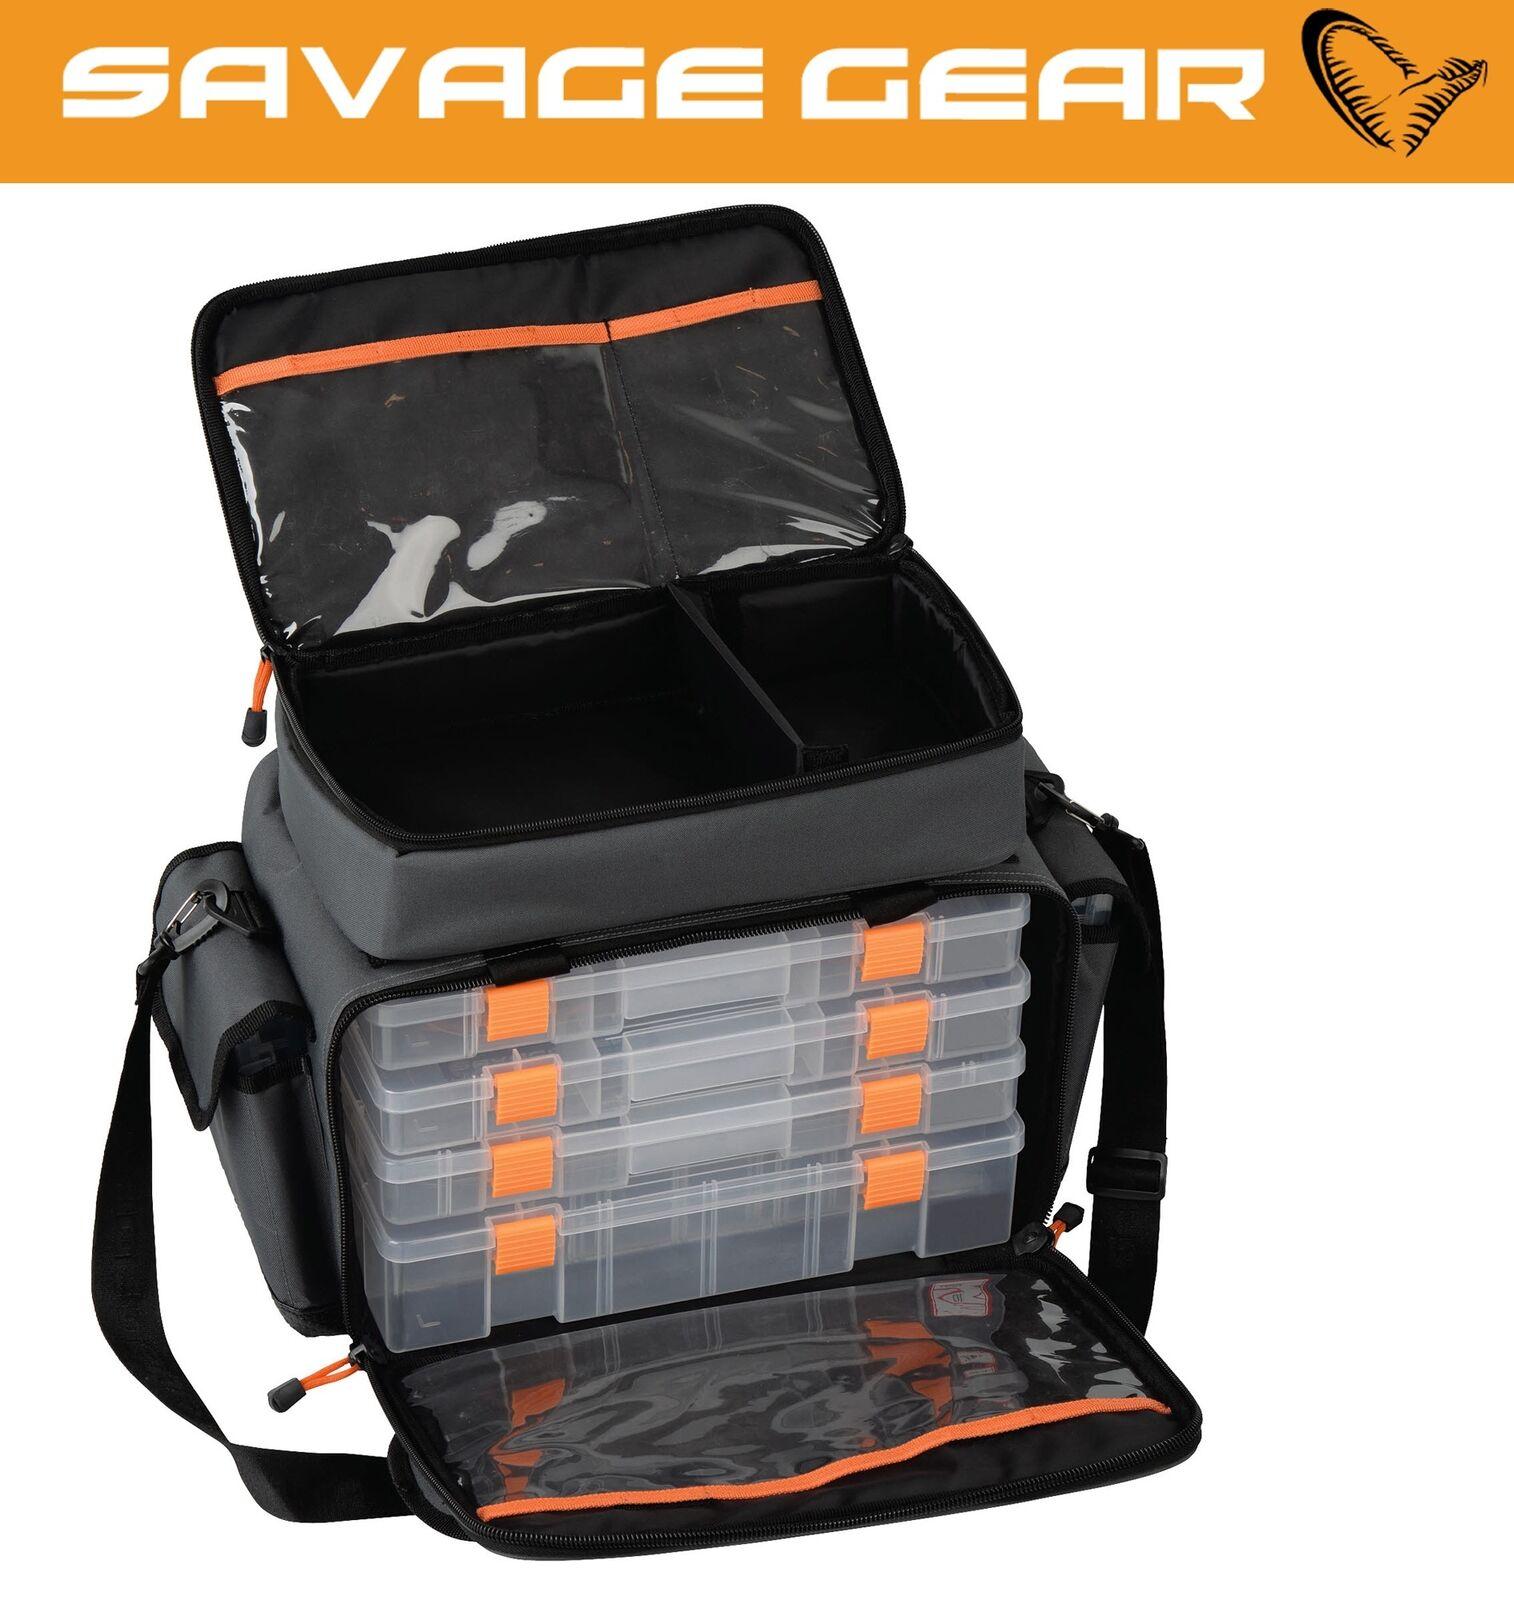 Savage Gear inkl. Lure Specialist Bag L Tasche 35x50x25cm inkl. Gear 6 Angelboxen bed6ef